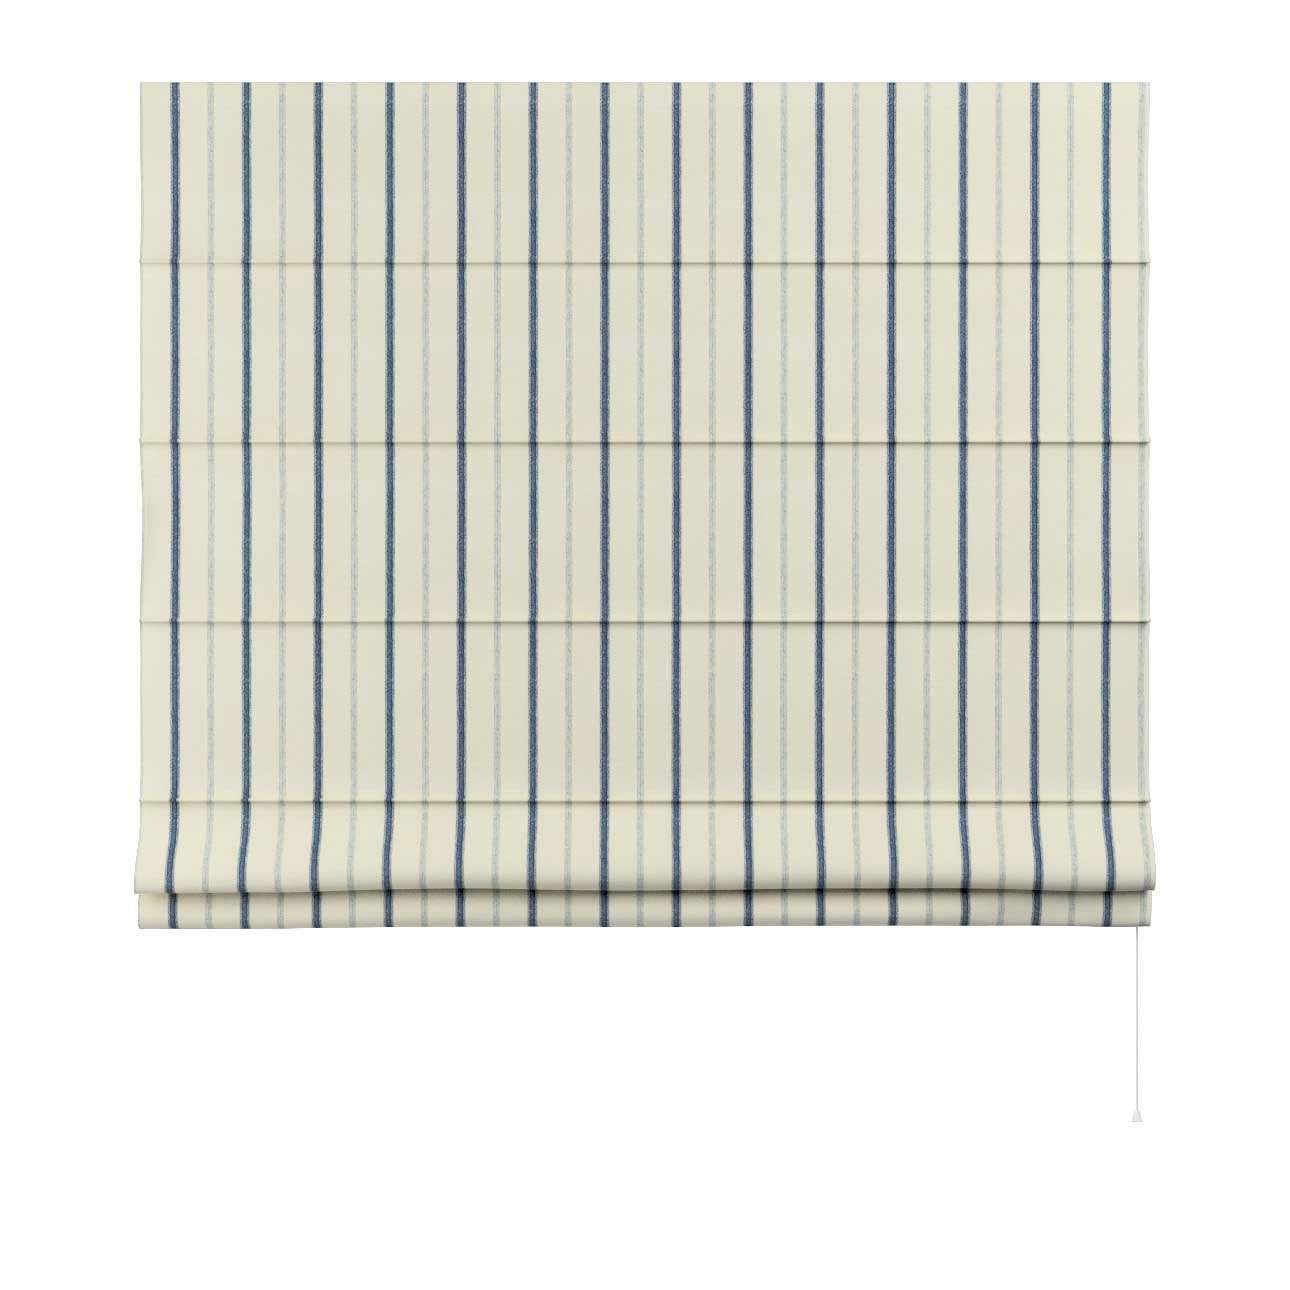 Romanetės Capri 80 x 170 cm (plotis x ilgis) kolekcijoje Avinon, audinys: 129-66